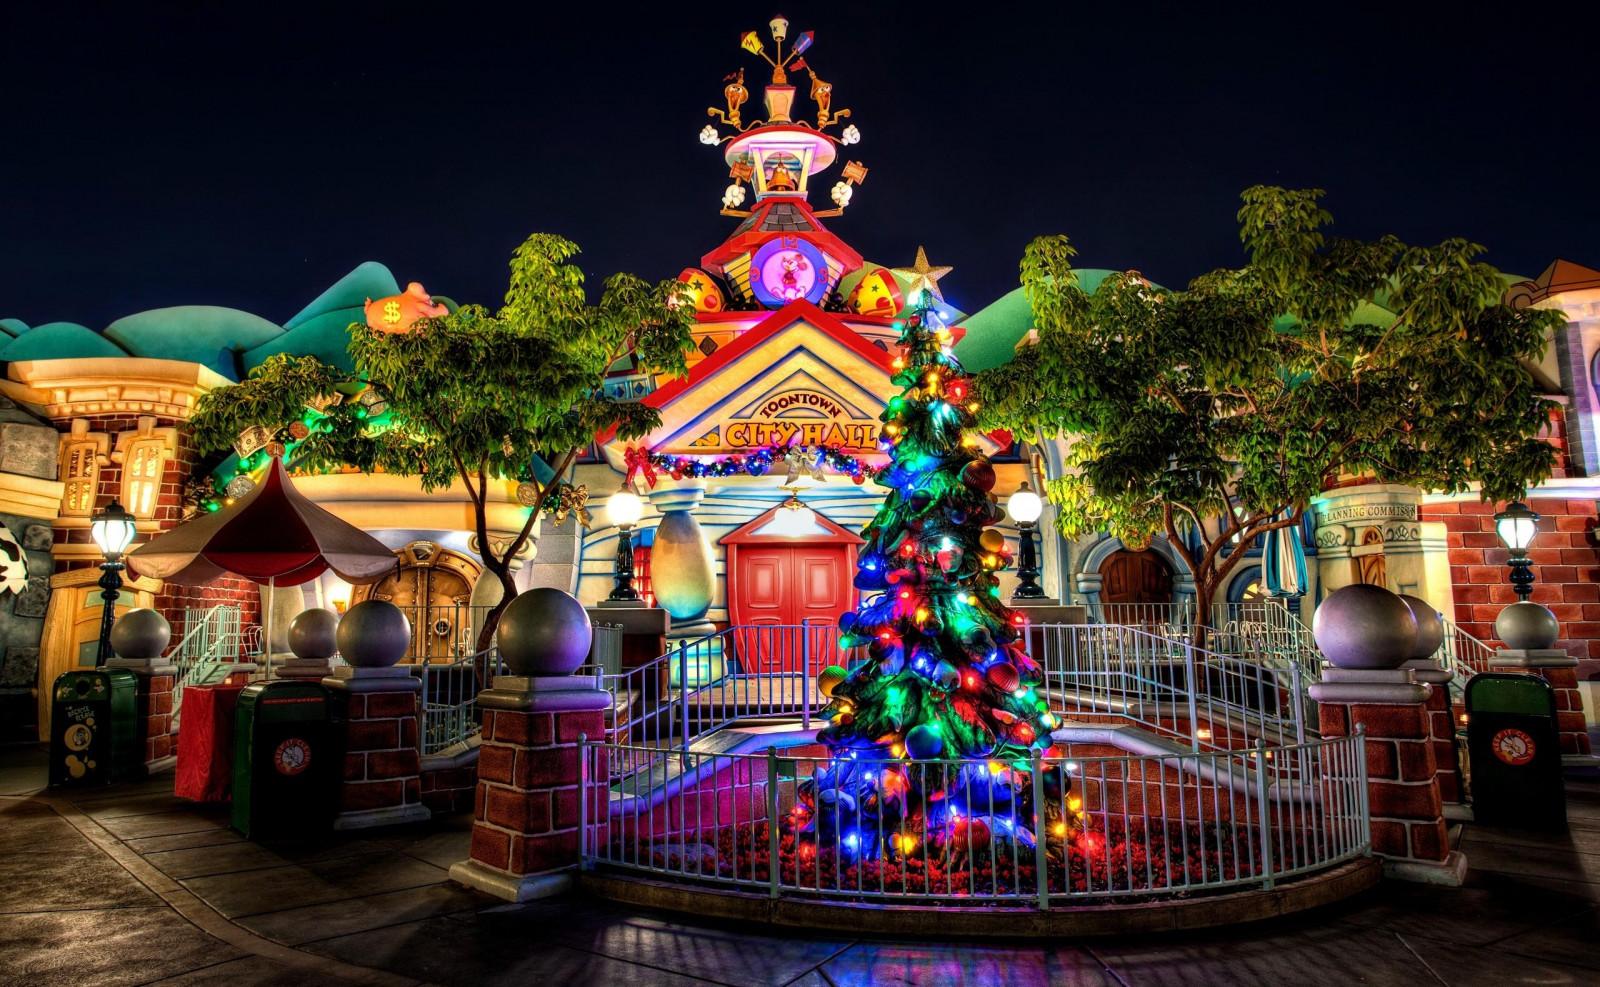 Wallpaper Christmas Tree Garland Building Entrance Celebration Cartoon 2560x1580 Goodfon 1048109 Hd Wallpapers Wallhere